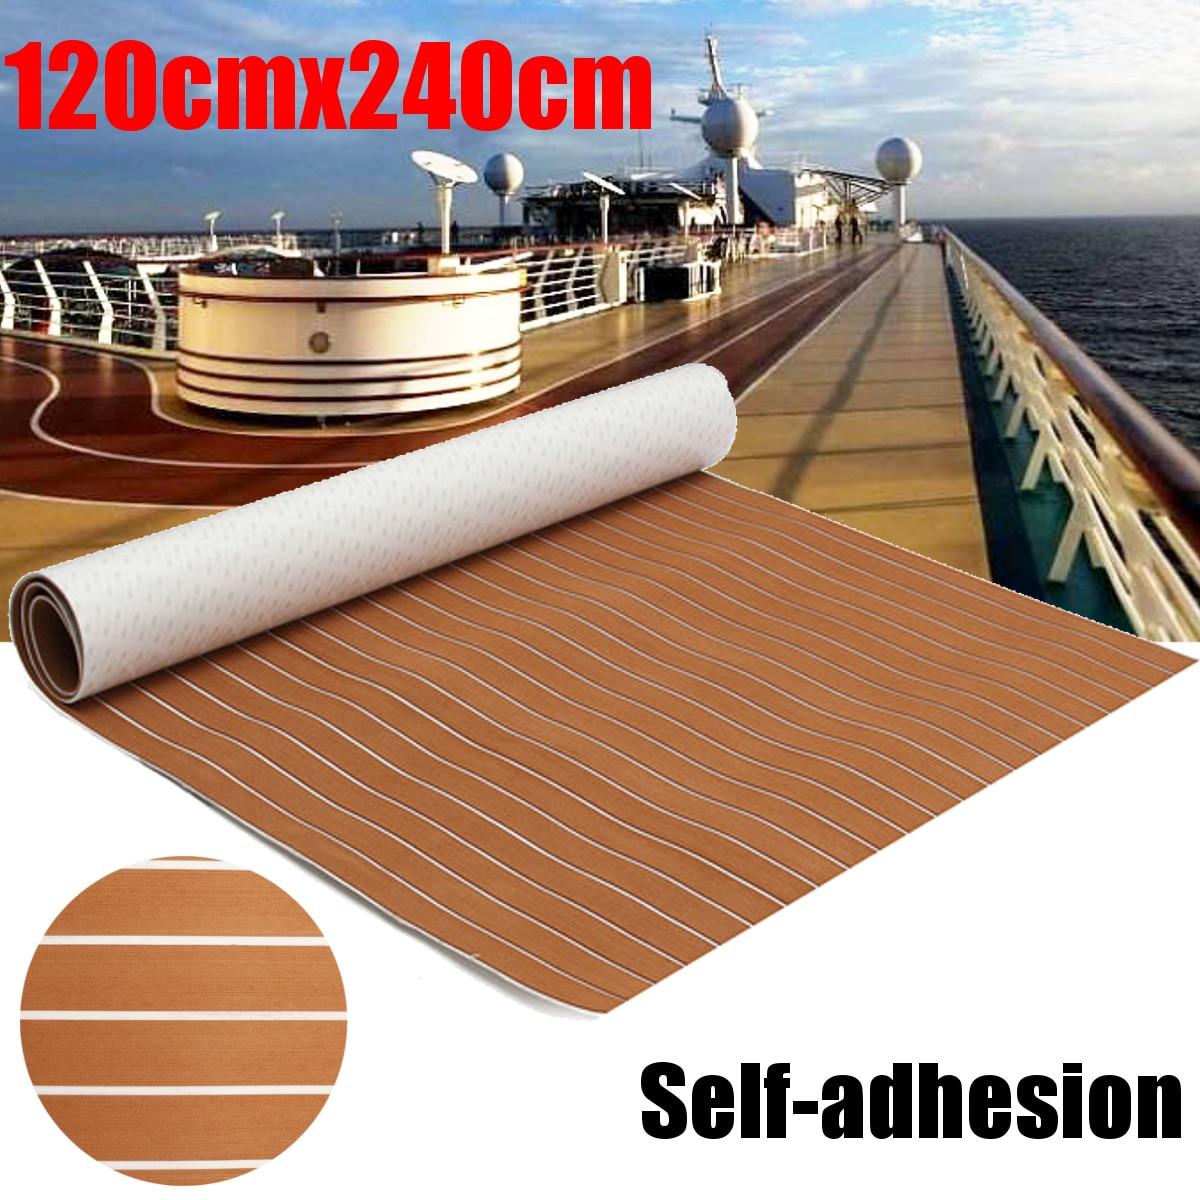 Teak Flooring Self Adhesive EVA Foam Teak Sheet Teak Boat Decking Marine Car Yacht Floor Mat Synthetic Teak Pad 1200x2400x5mm колонки tannoy autograph mini teak